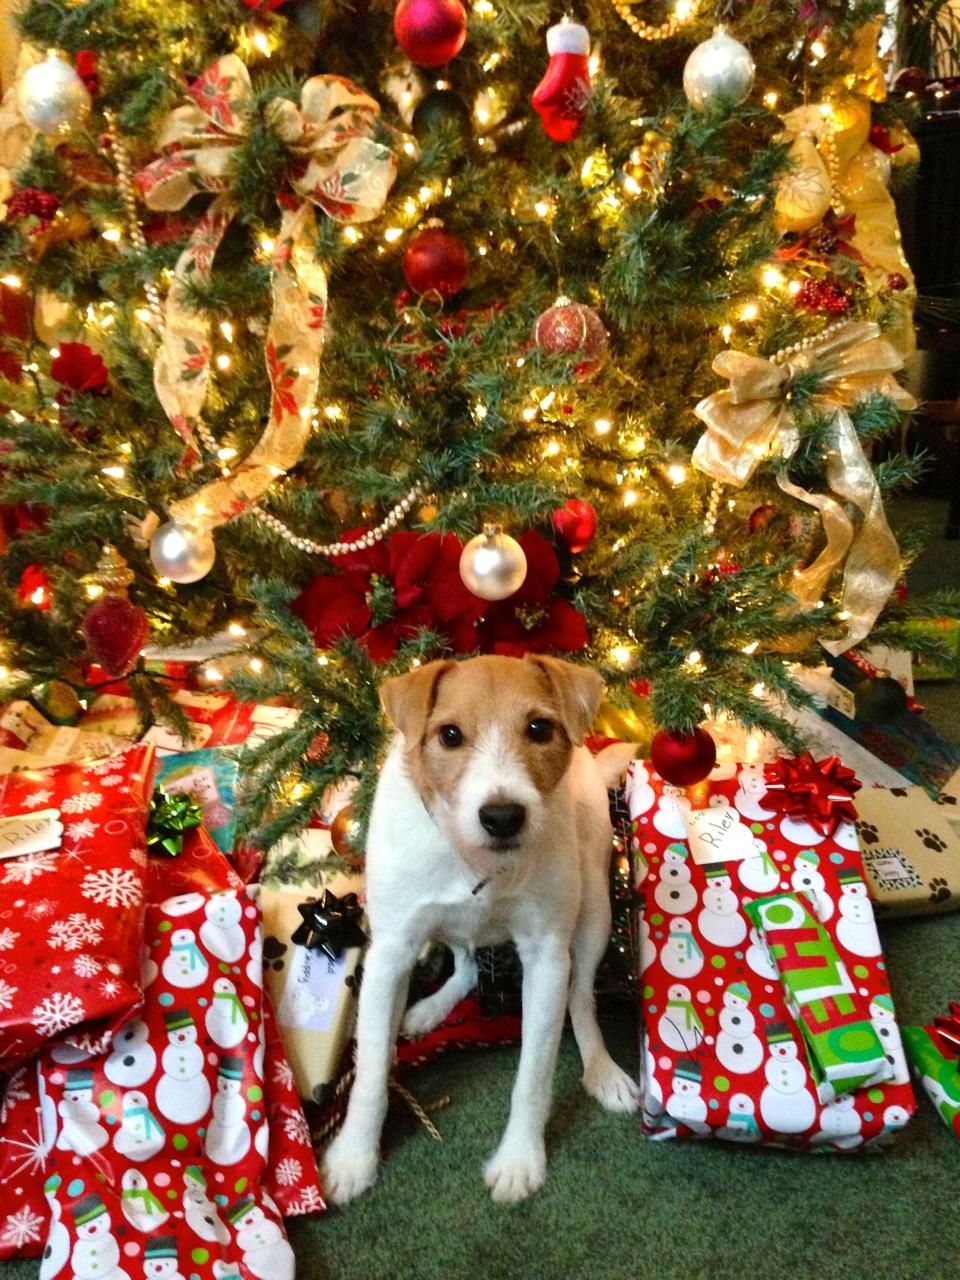 Merry Chipmas!